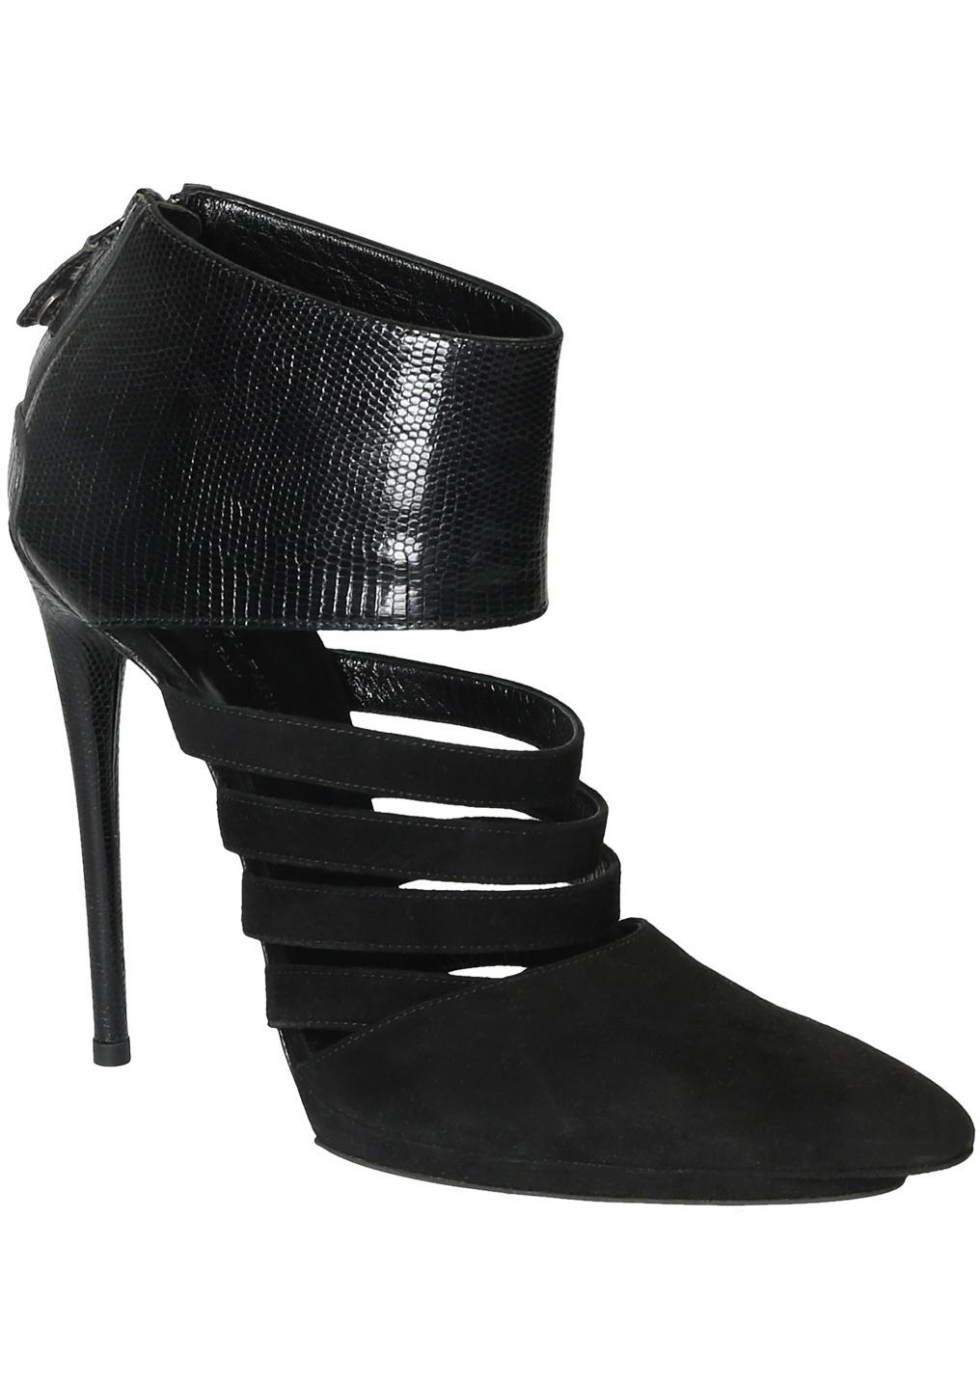 la meilleure attitude 1e634 0ebad Balenciaga Bootines femme en daim noir à talon hautes ...